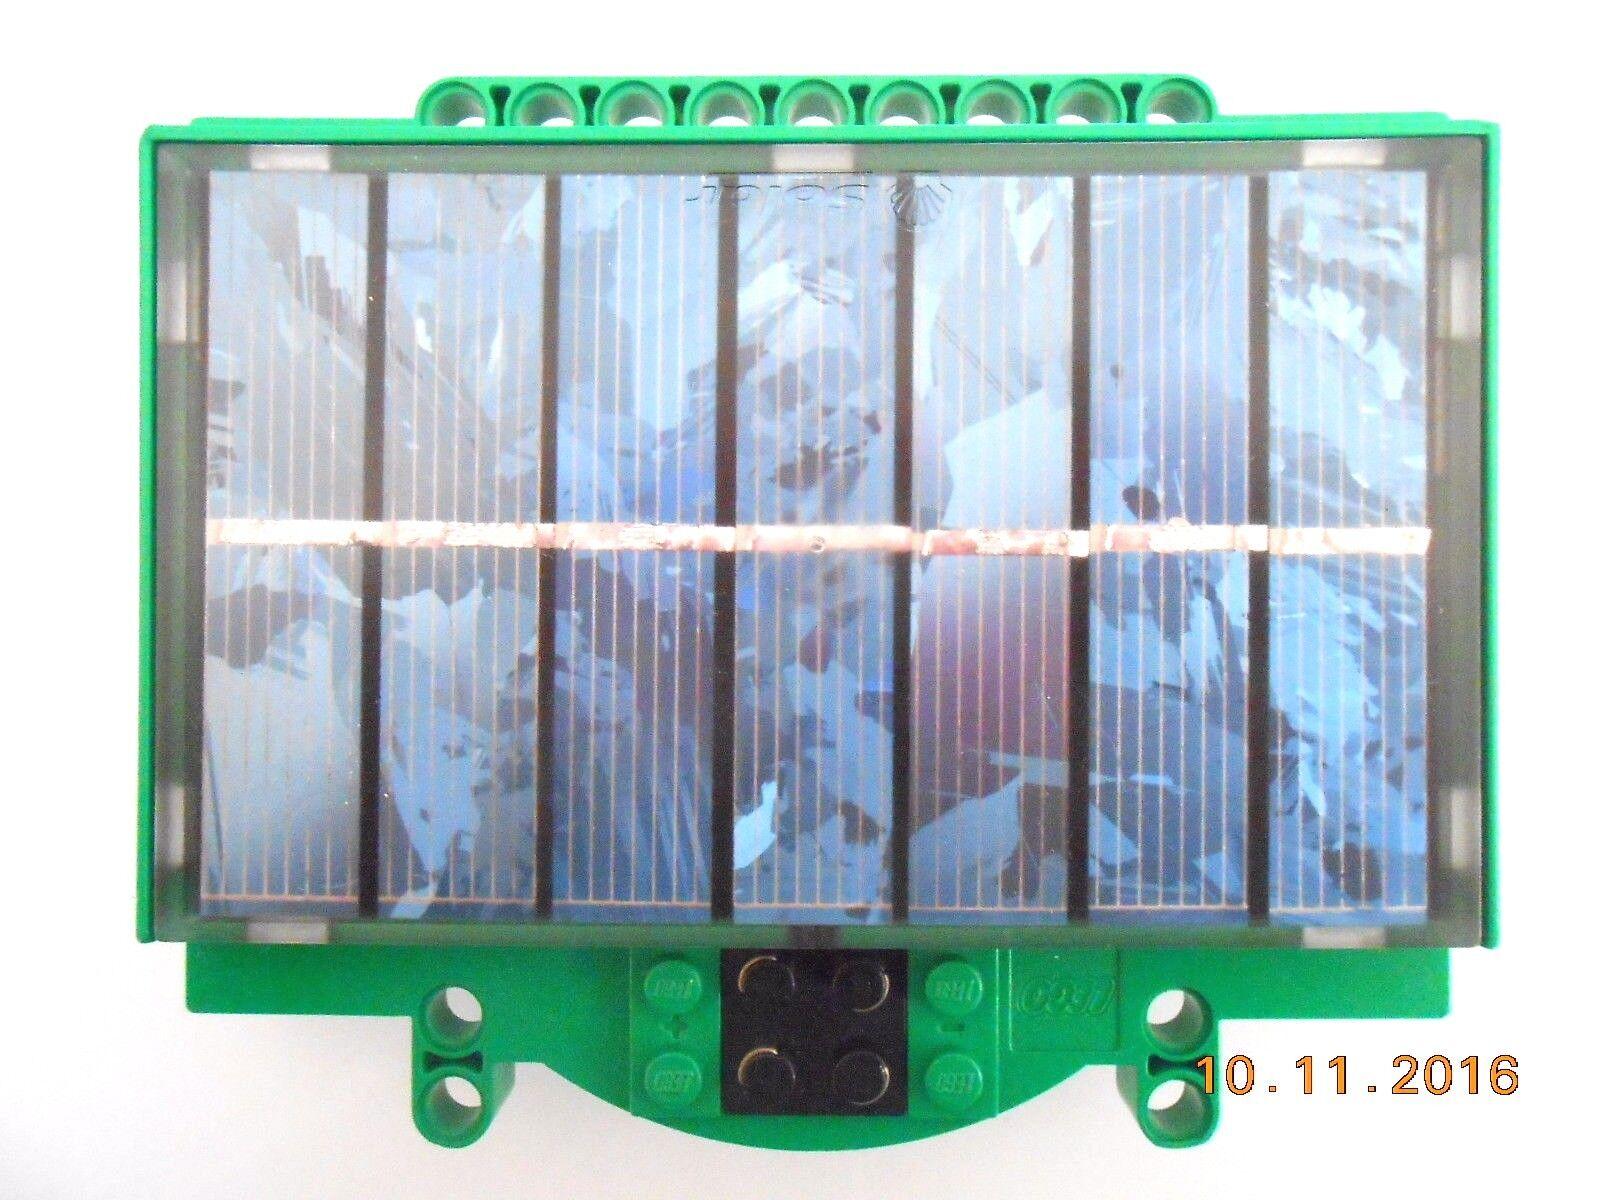 LEGO pannello solare   RARO